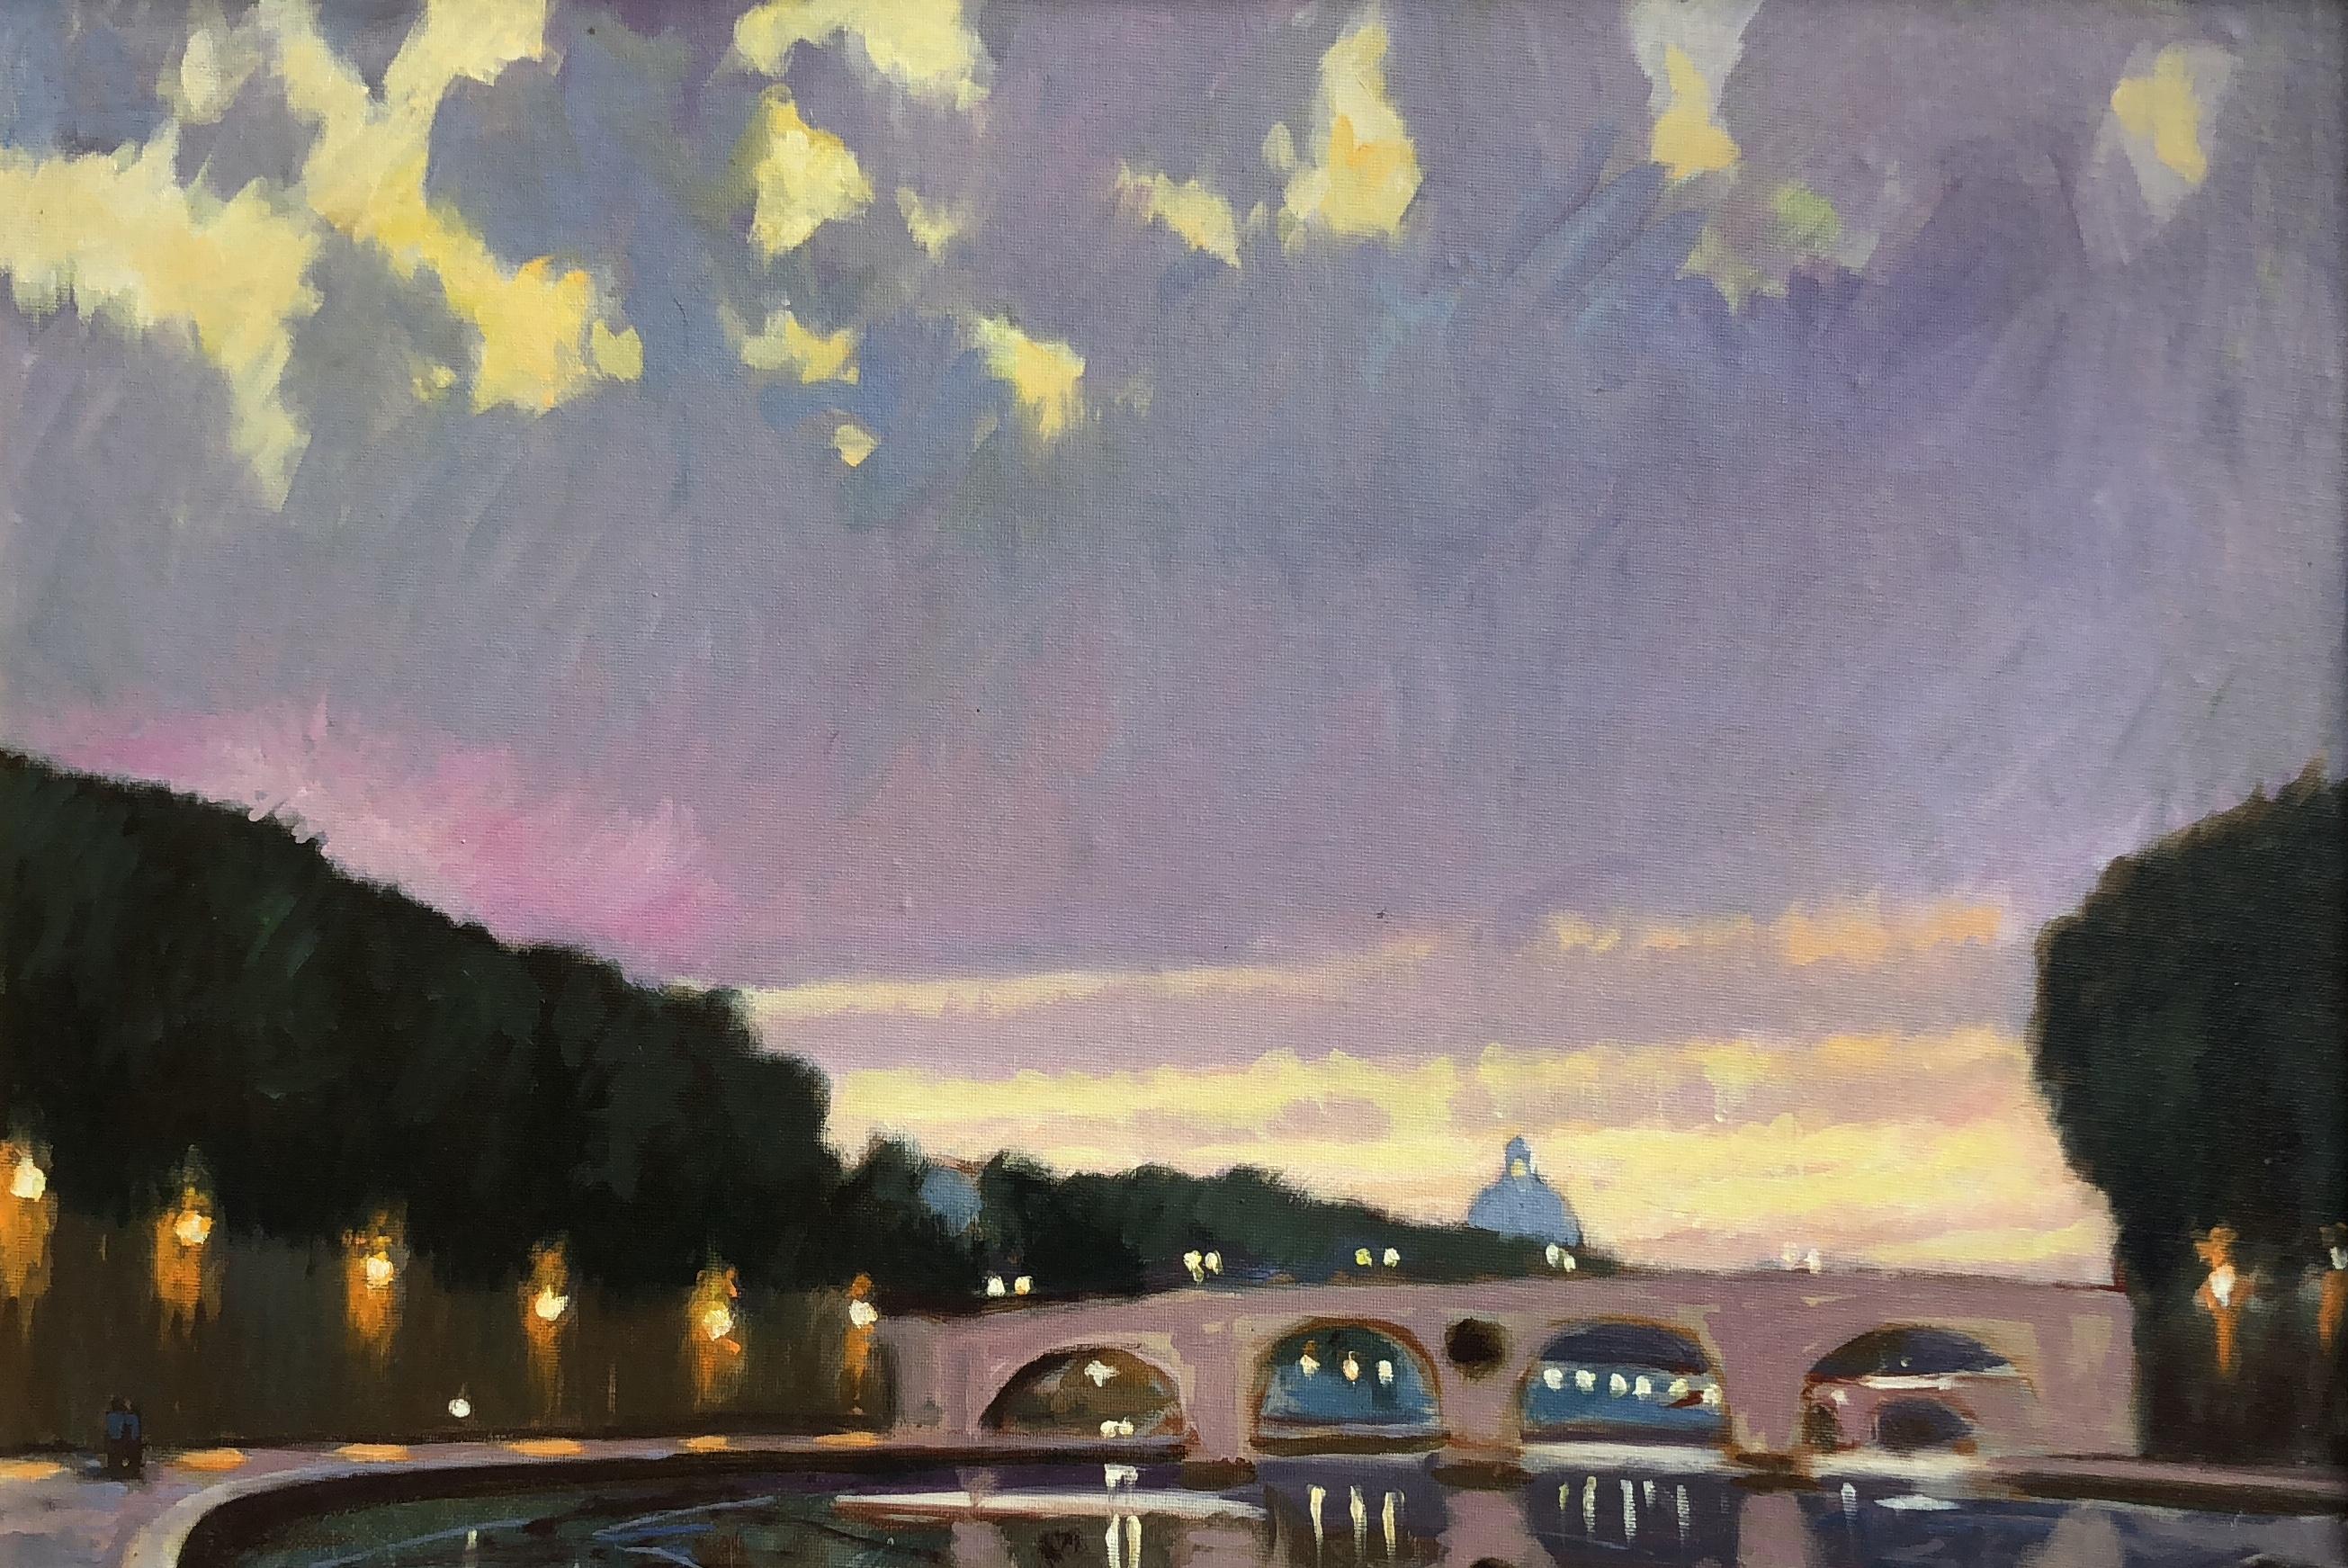 Tiber River - Sept. Eve